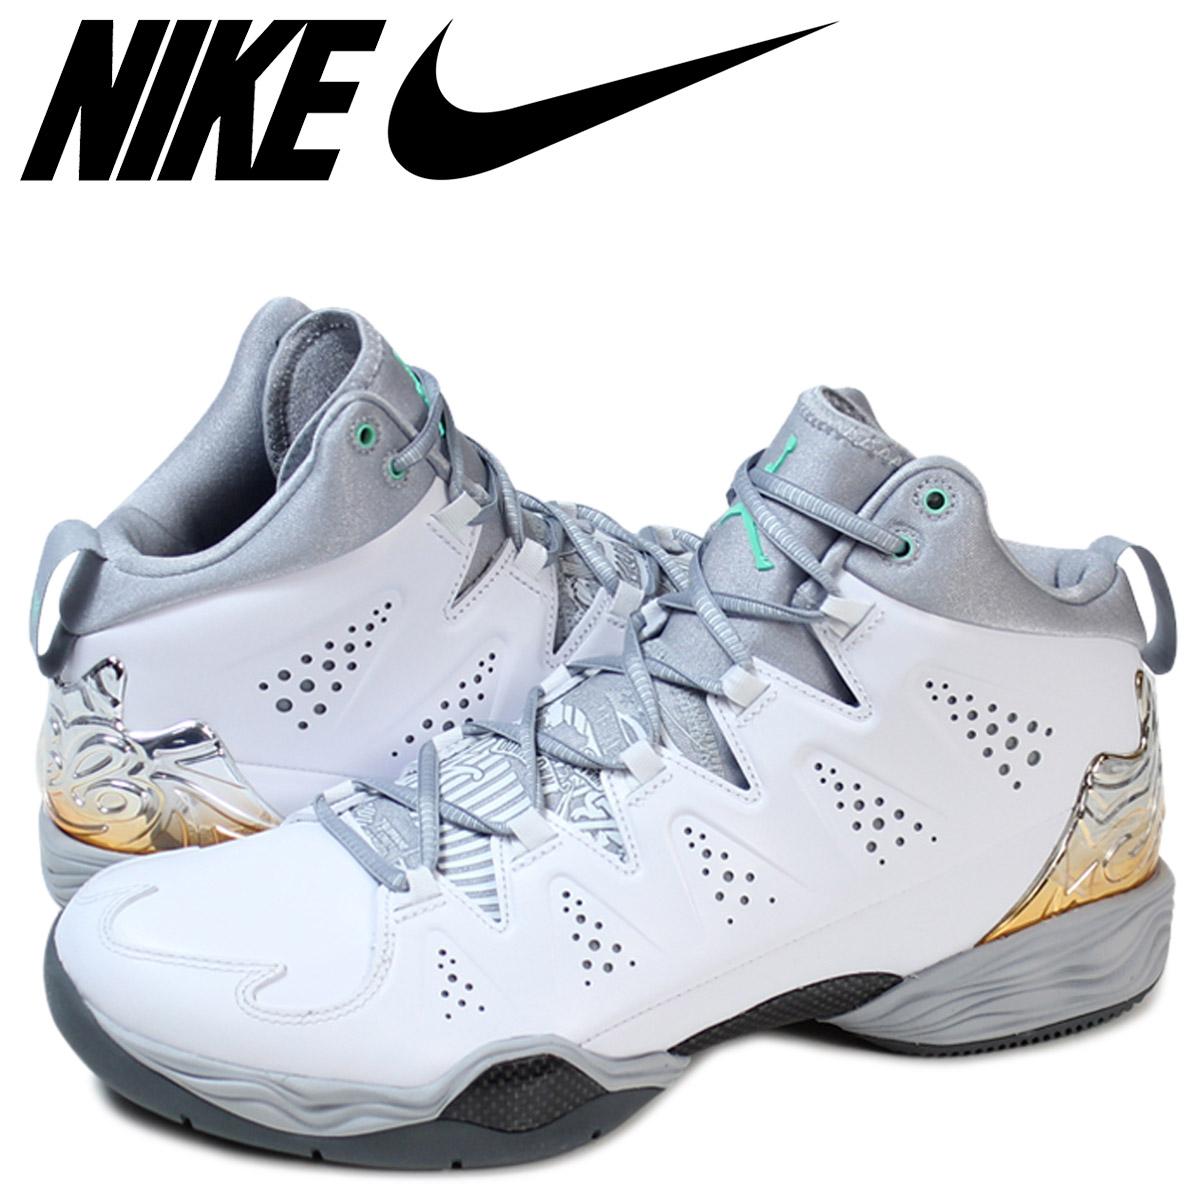 a3193dec814c ALLSPORTS  NIKE Nike Air Jordan sneakers AIR JORDAN MELO M10 Air ...